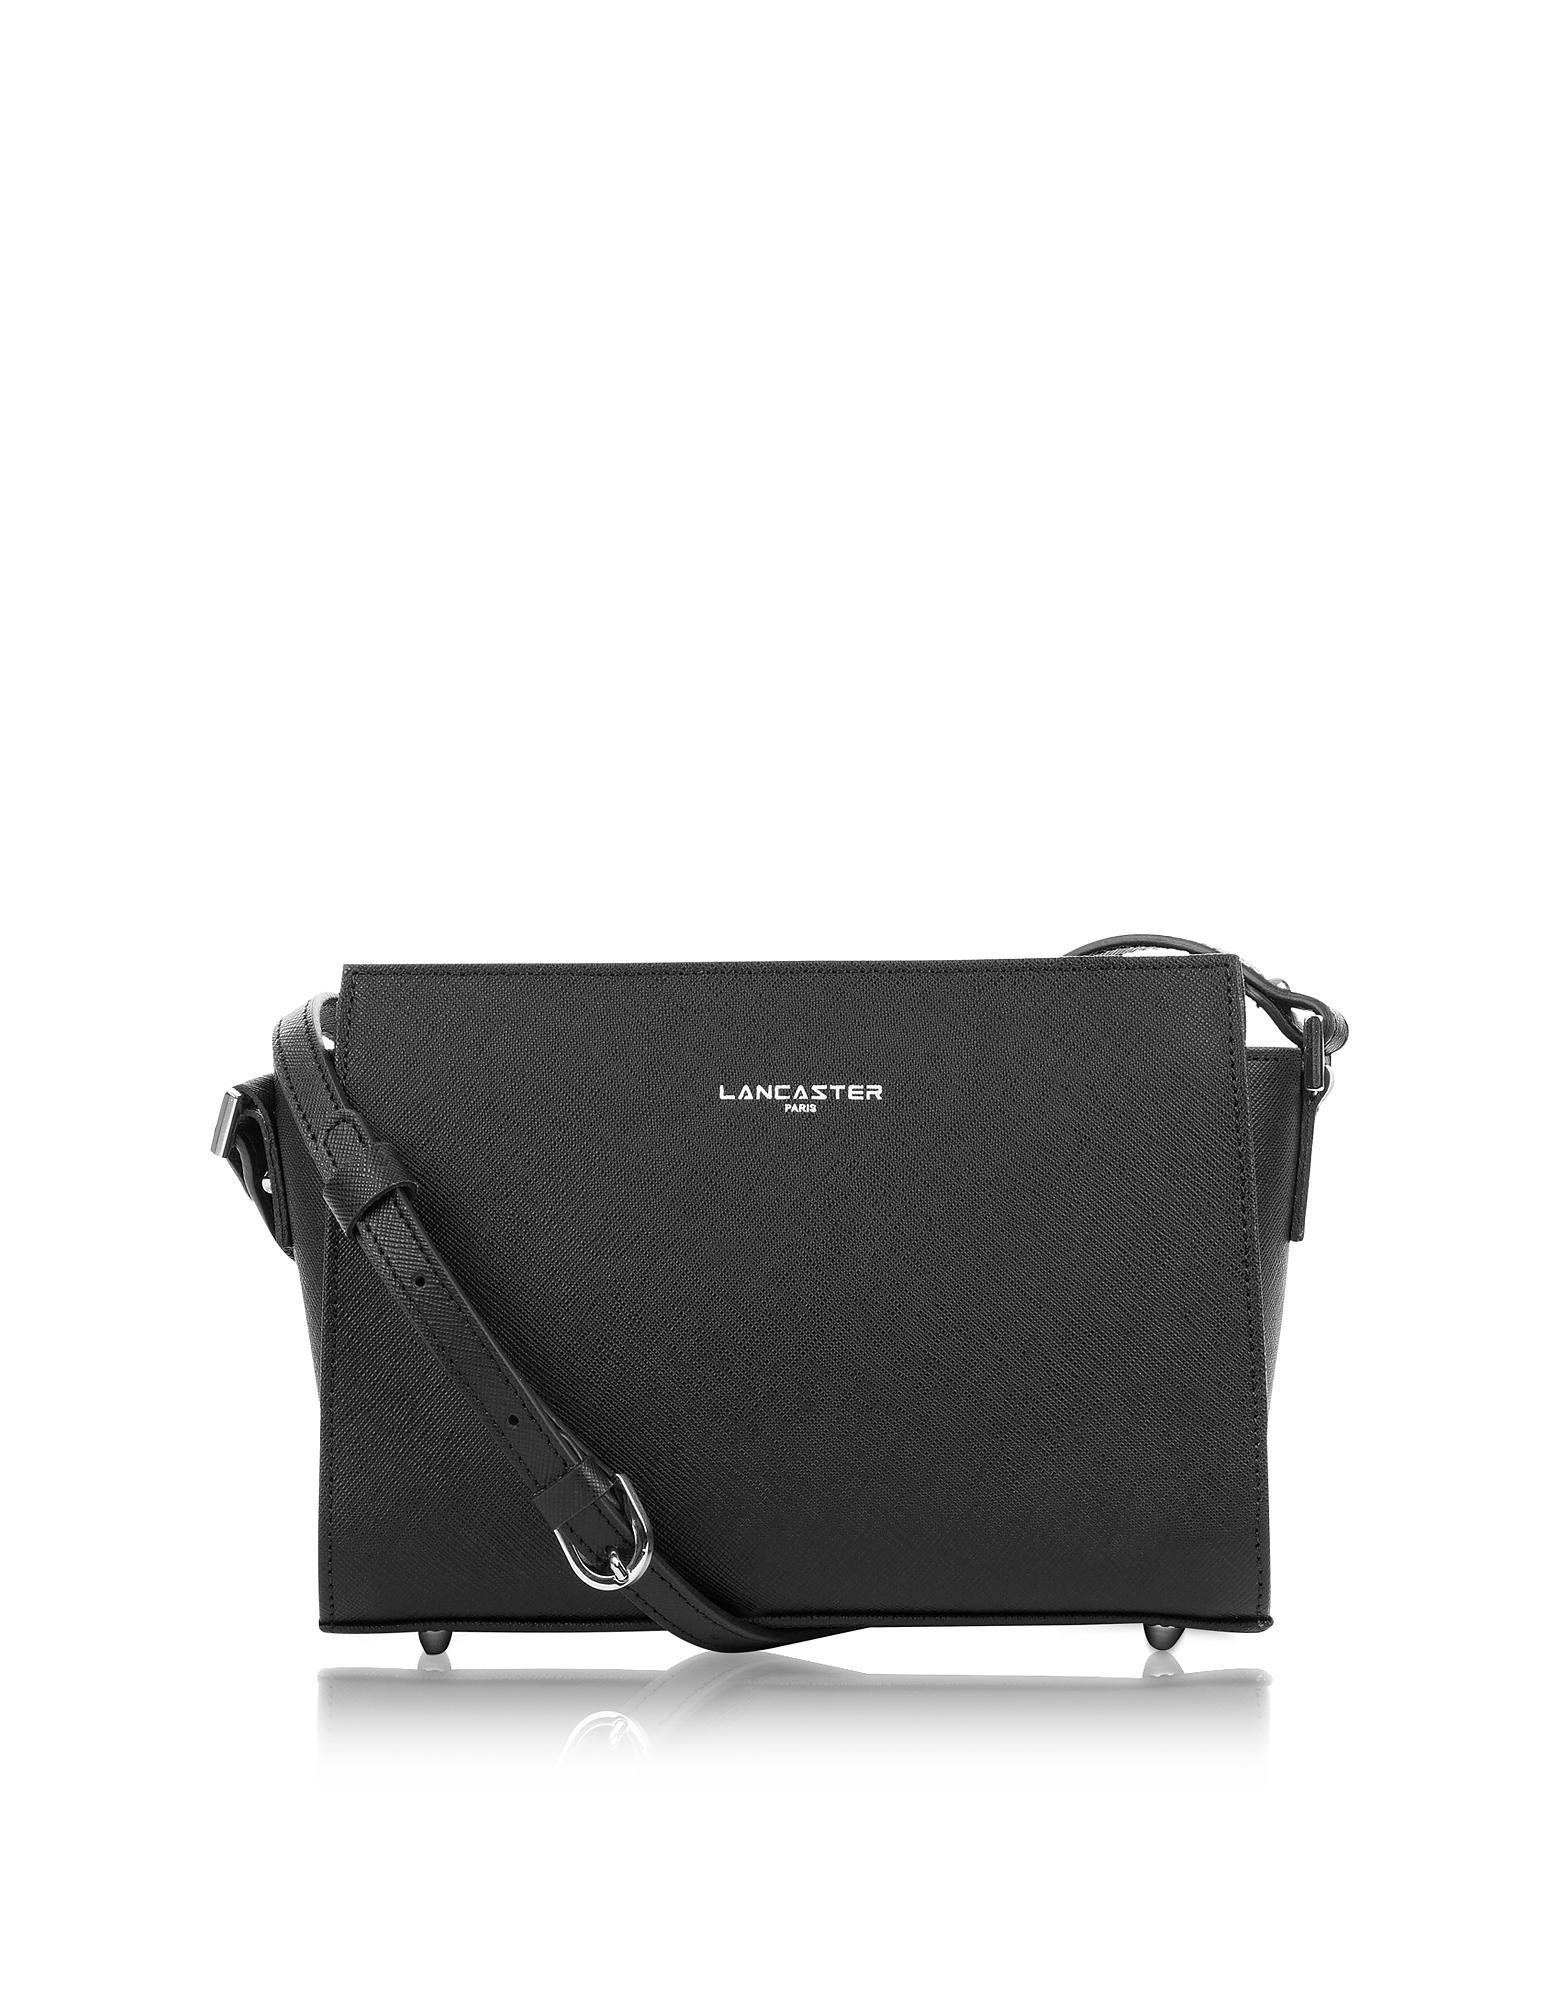 85a3dad07113 Lancaster Paris. Women's Adele Black Saffiano Leather Small Crossbody Bag